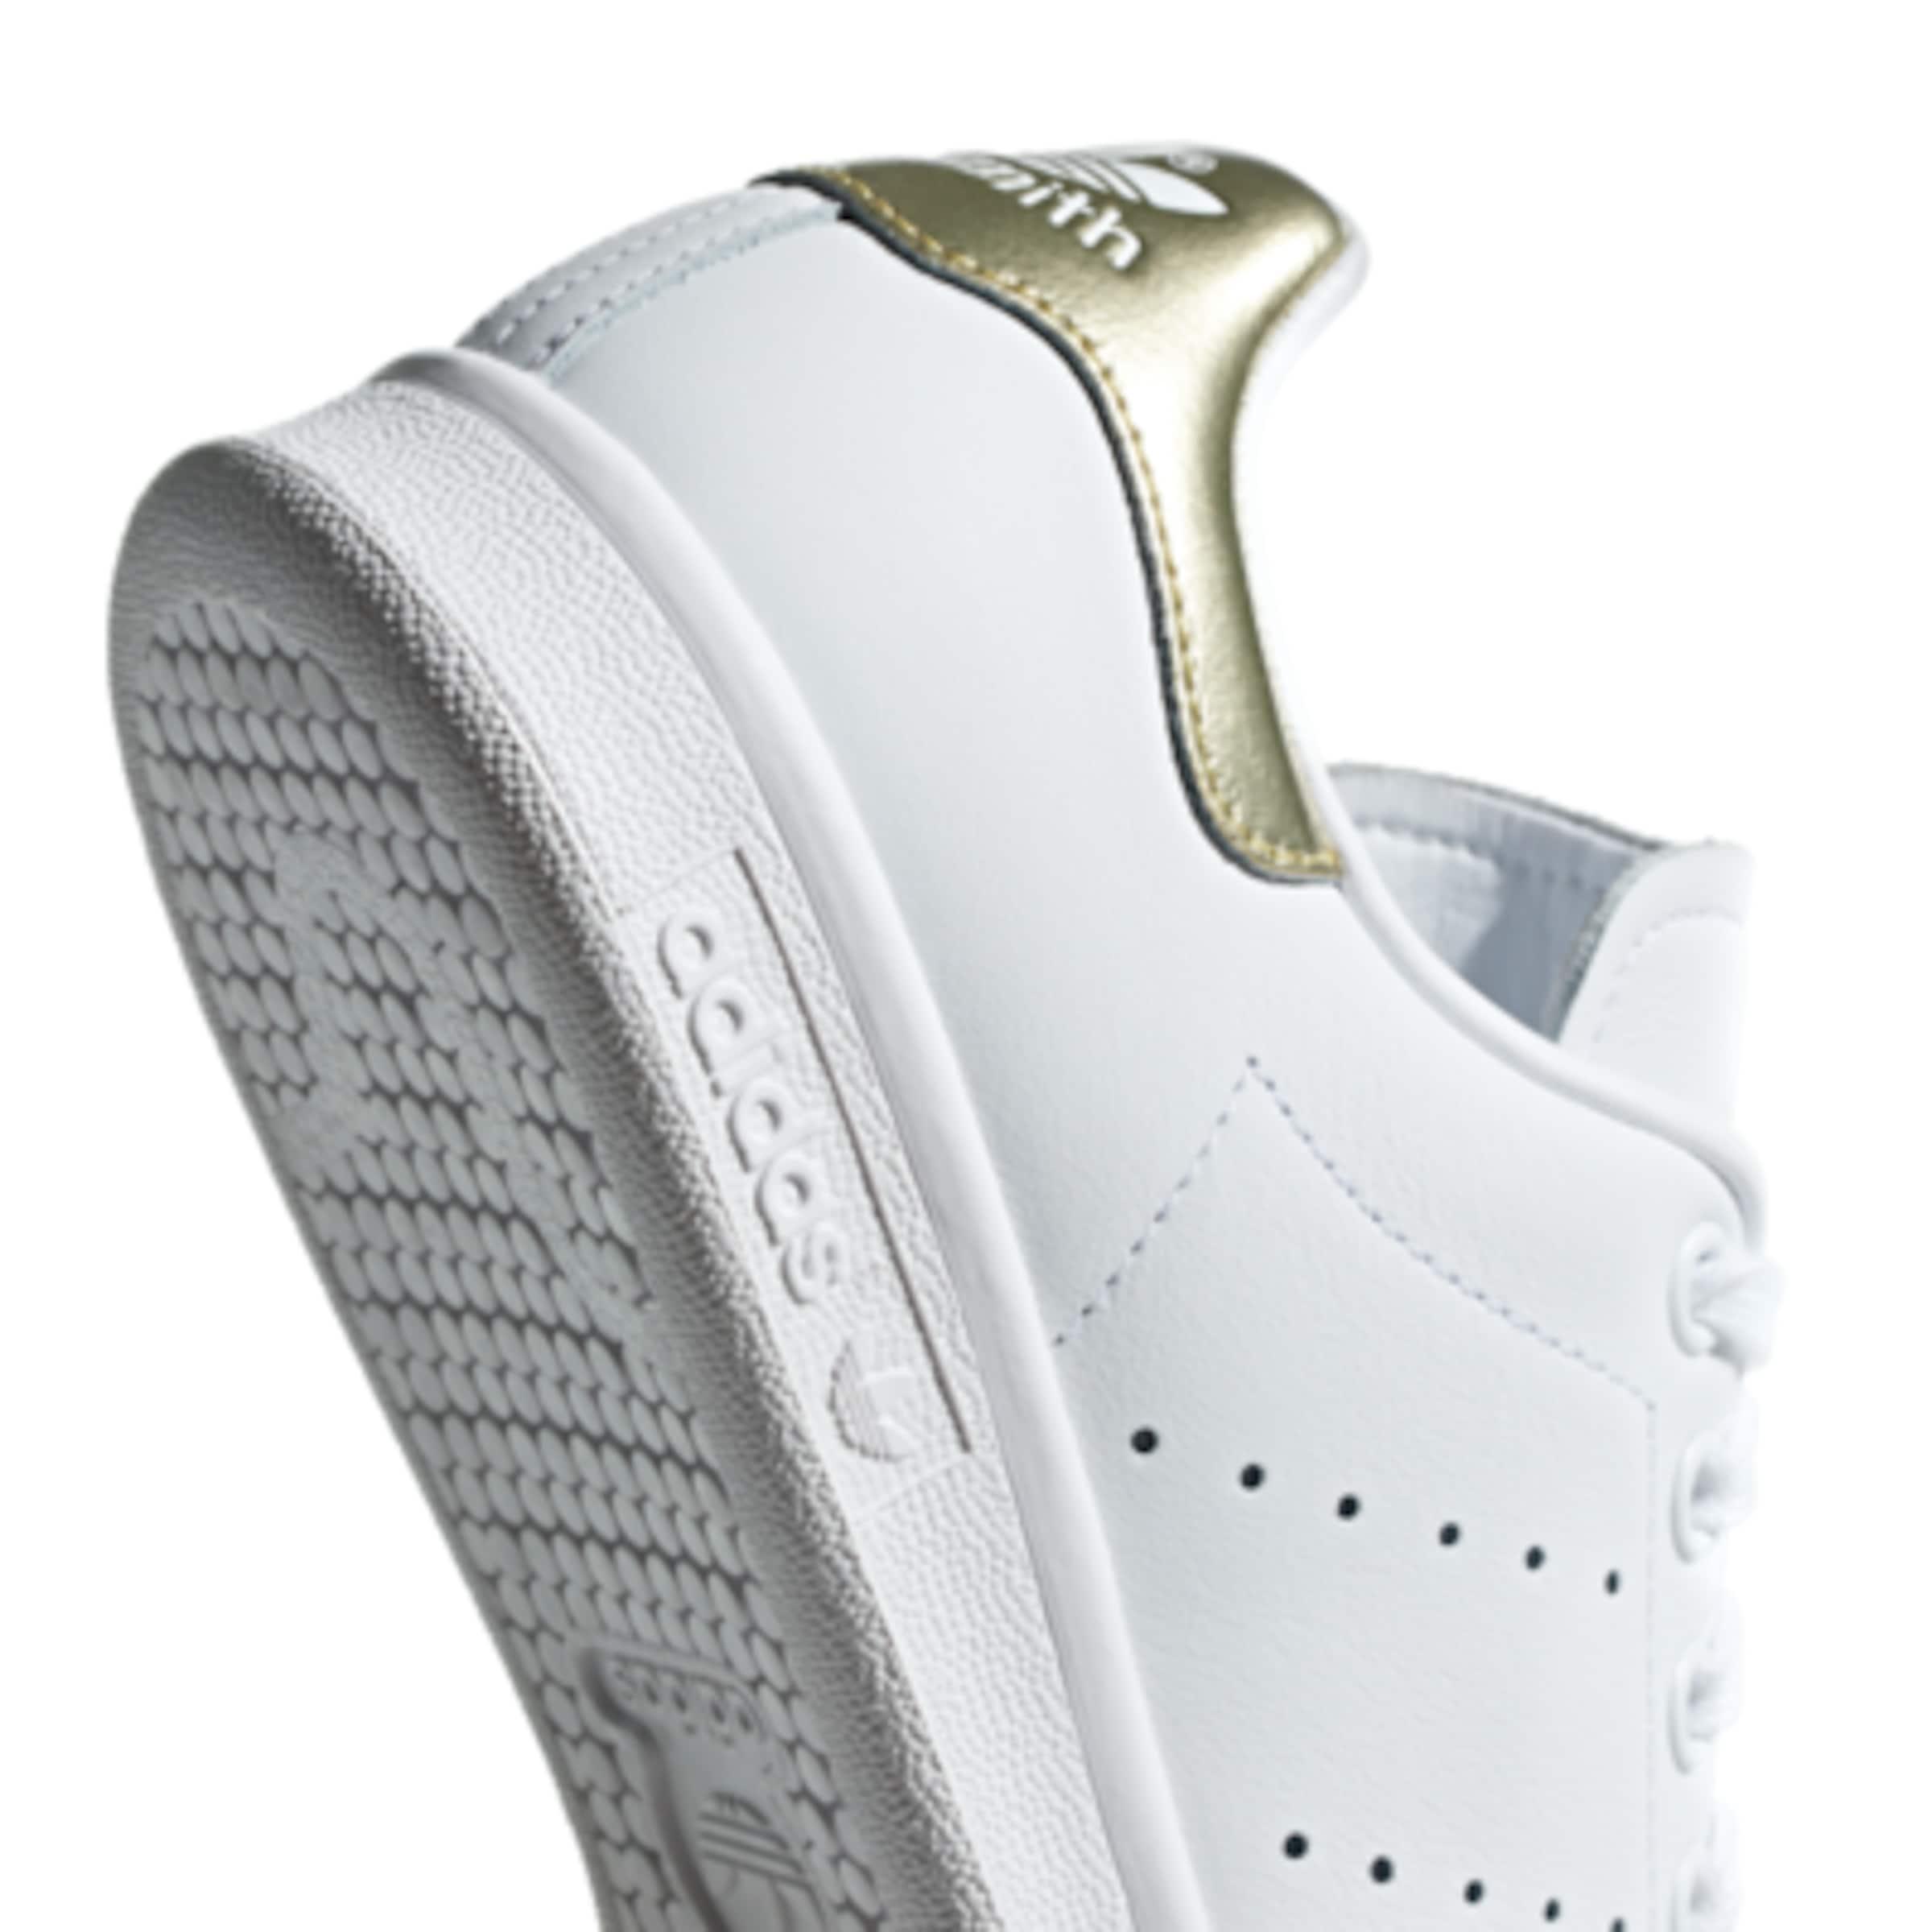 Baskets Adidas OrBlanc Basses En Originals 'stan Smith' USzVpqMG